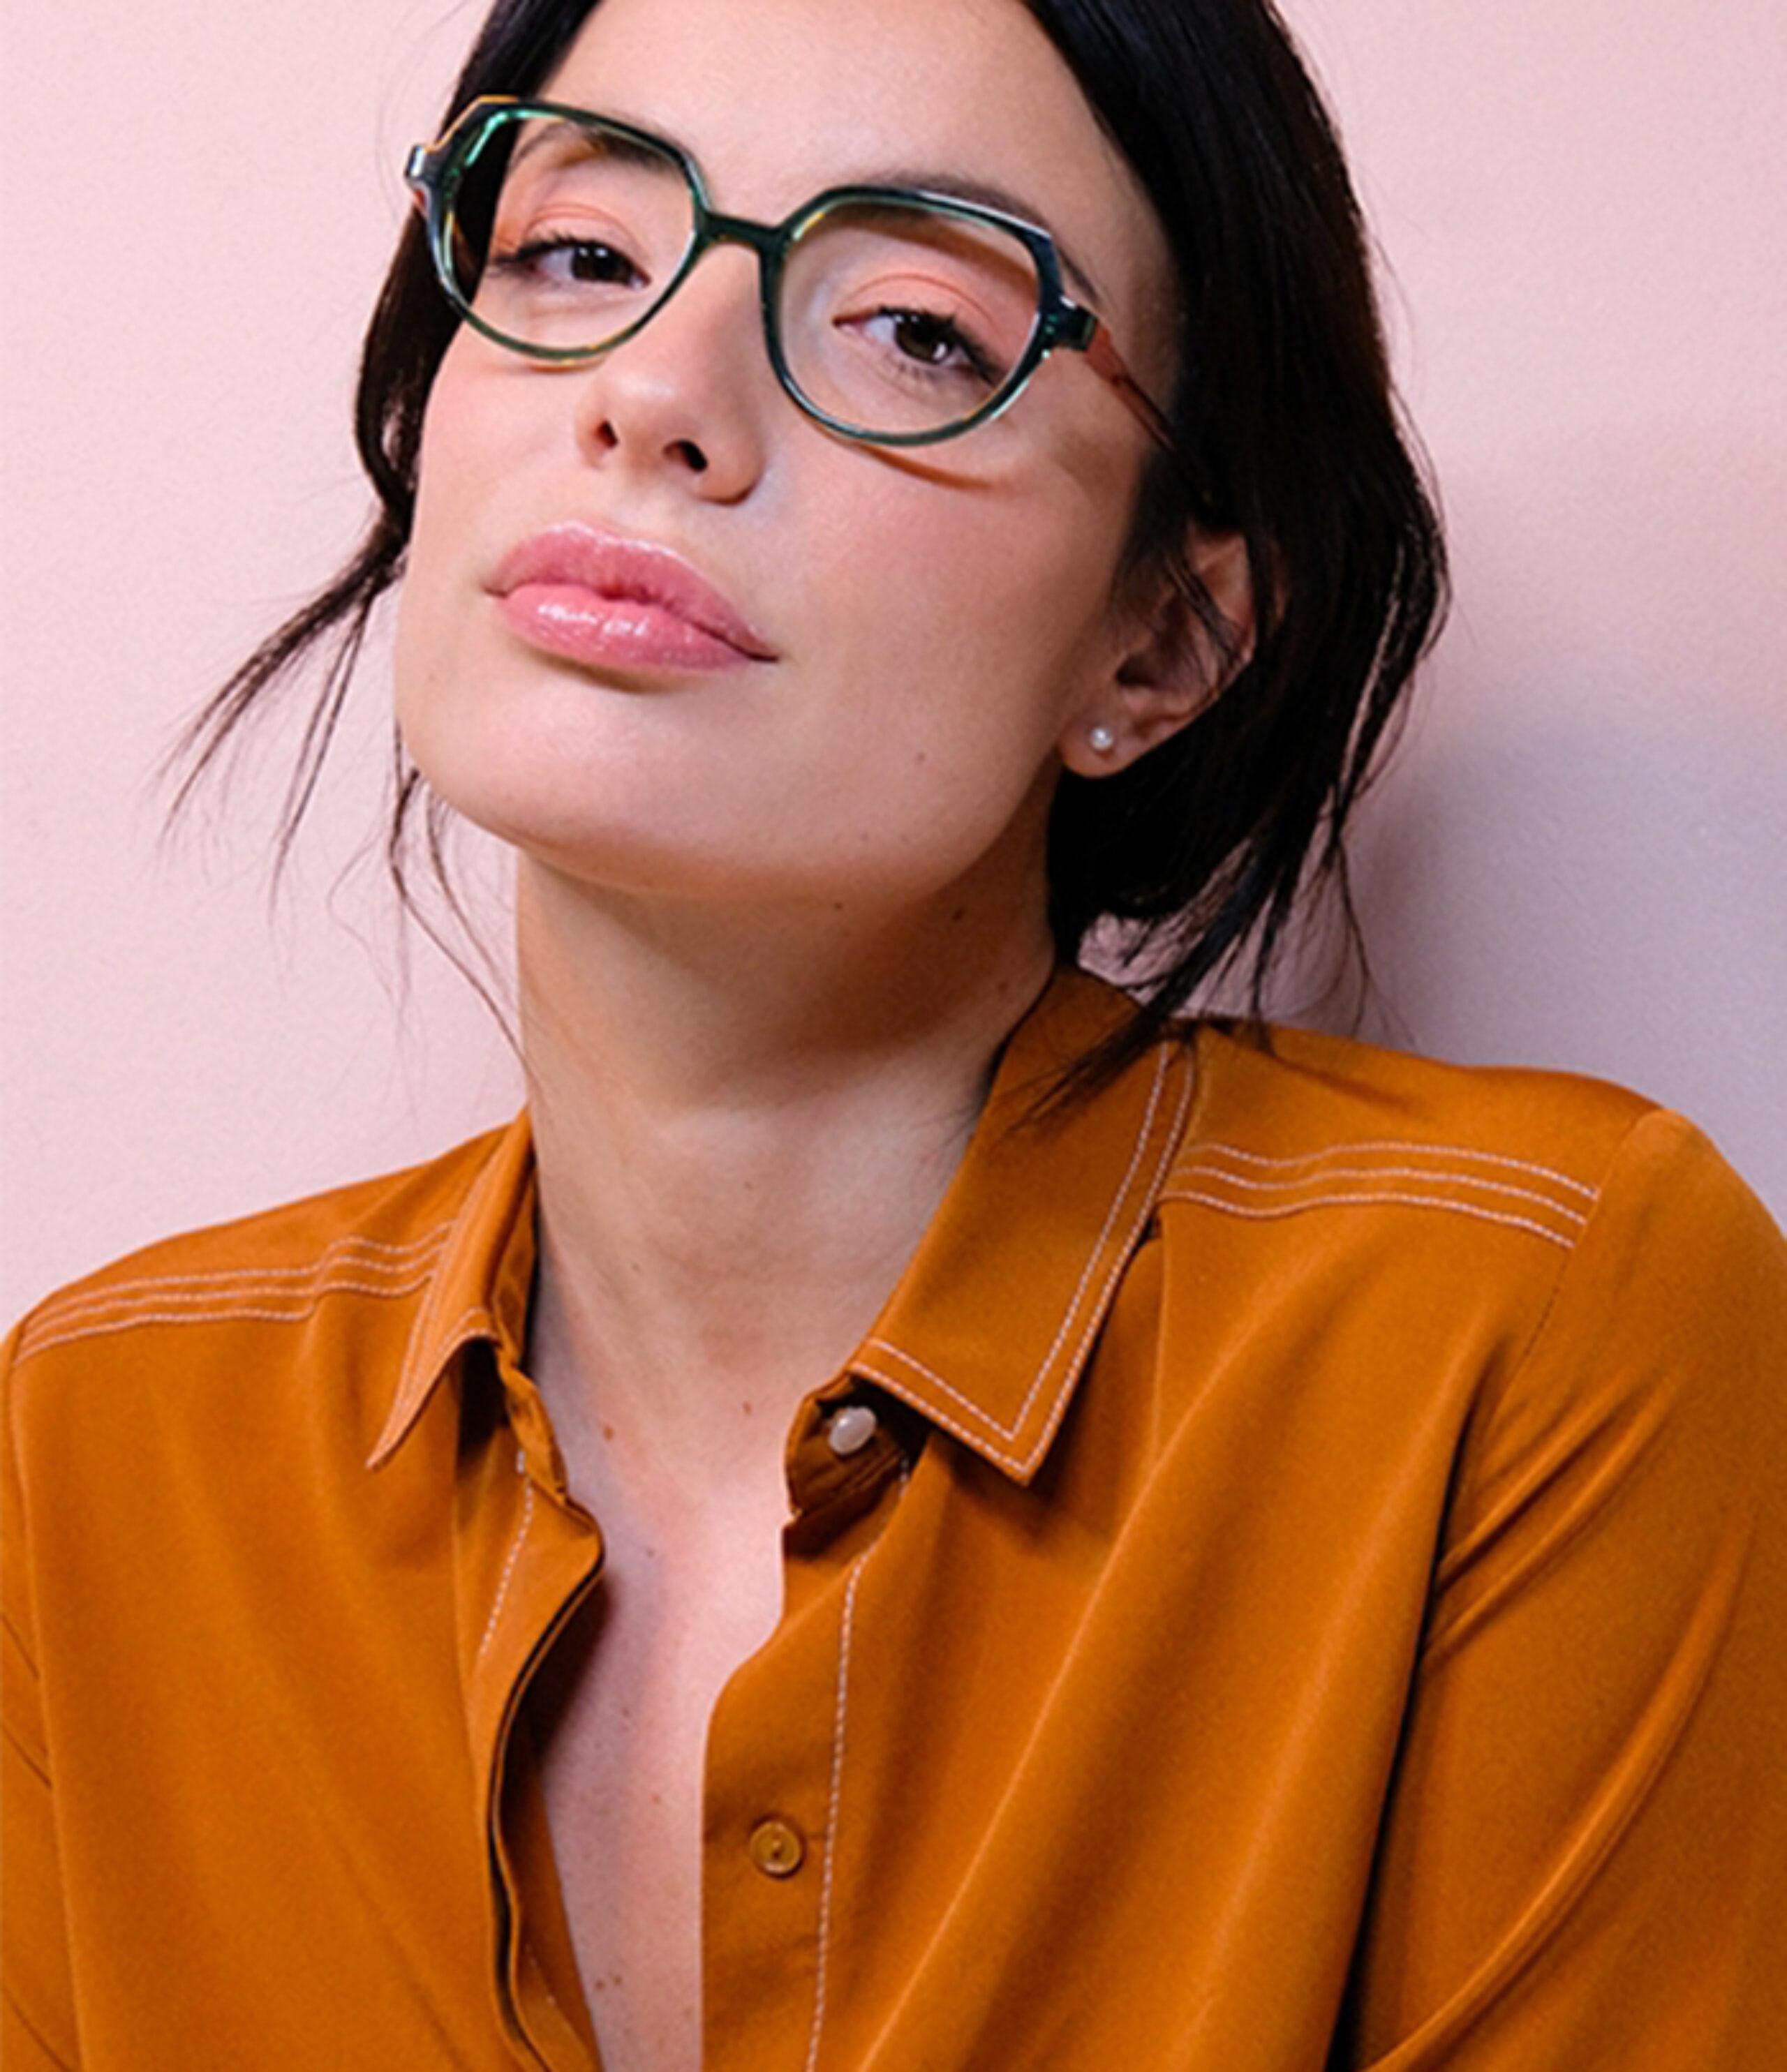 Blush brillen en zonnebrillen • optiek Frames and Faces Deinze